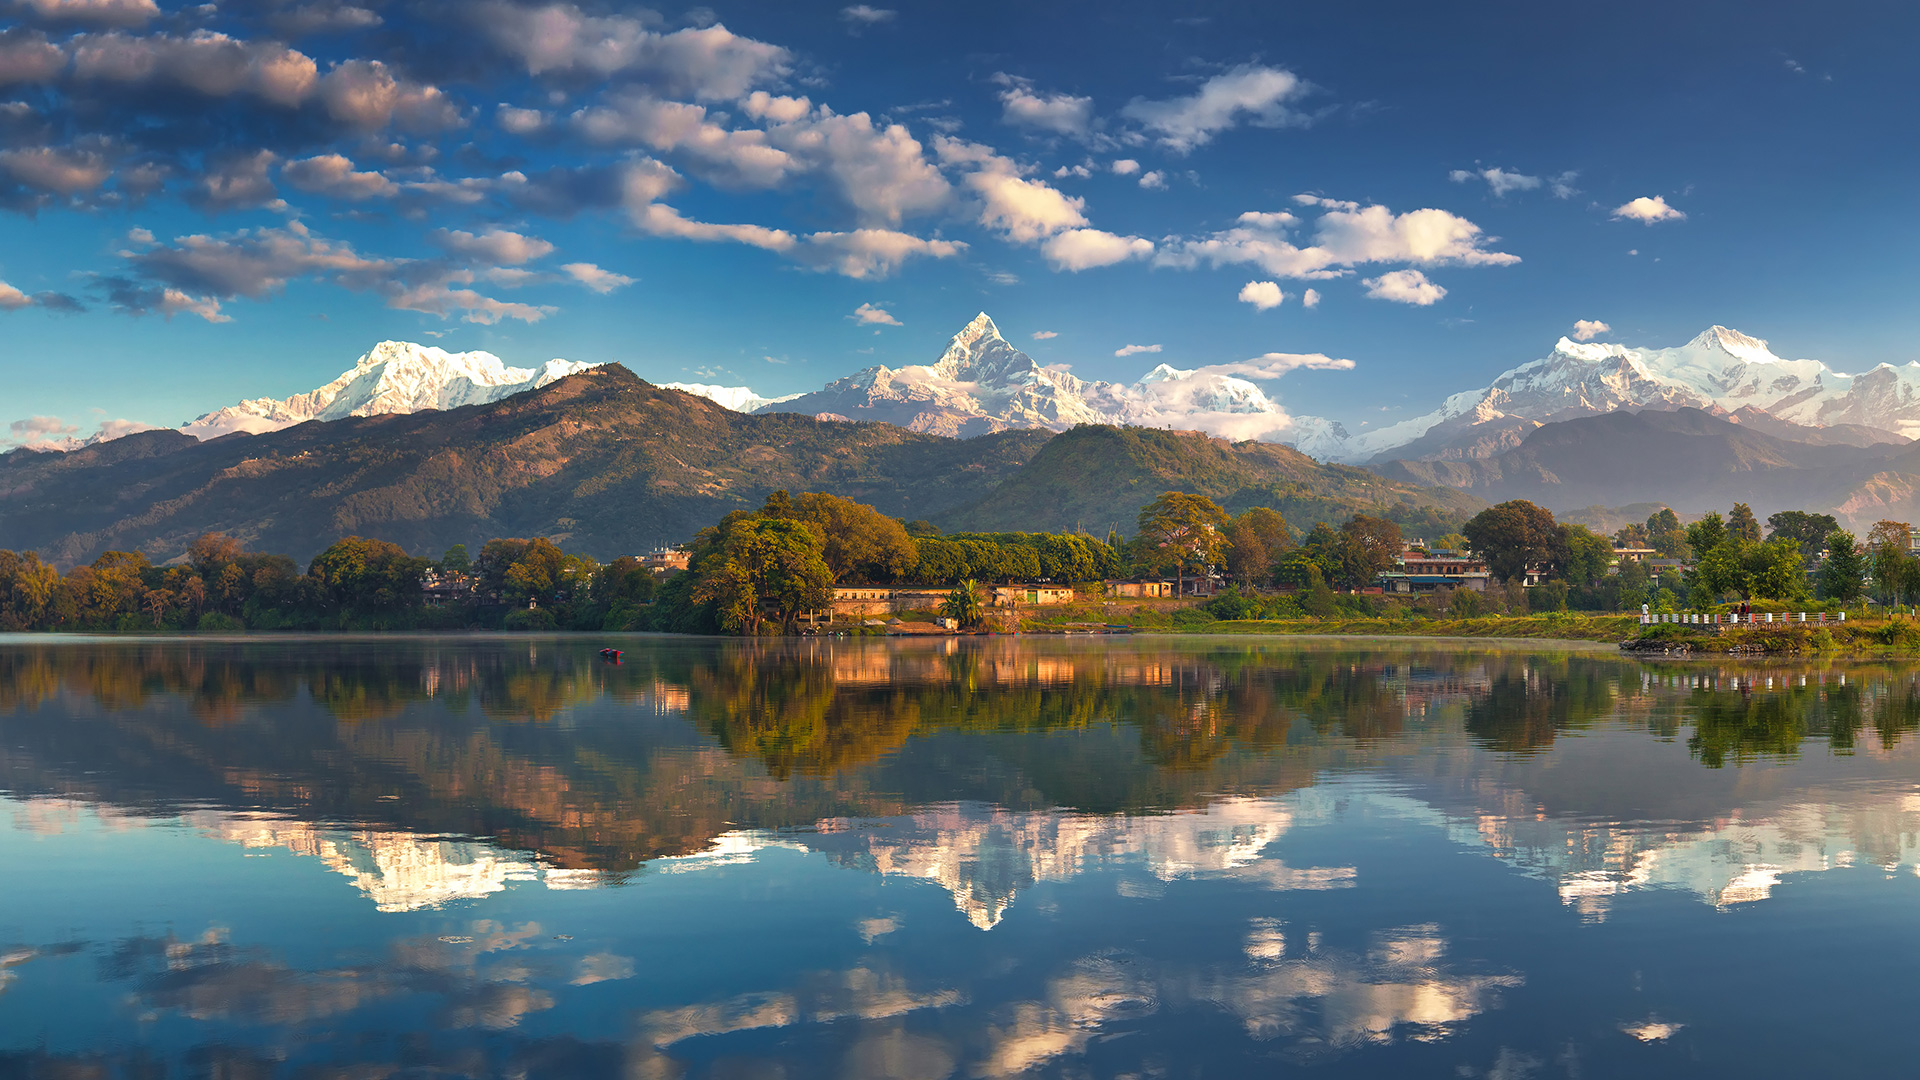 Fall Landscape Wallpaper Fishtail Lodge Pokhara Nepal ⋆ Hotel ⋆ Greaves India